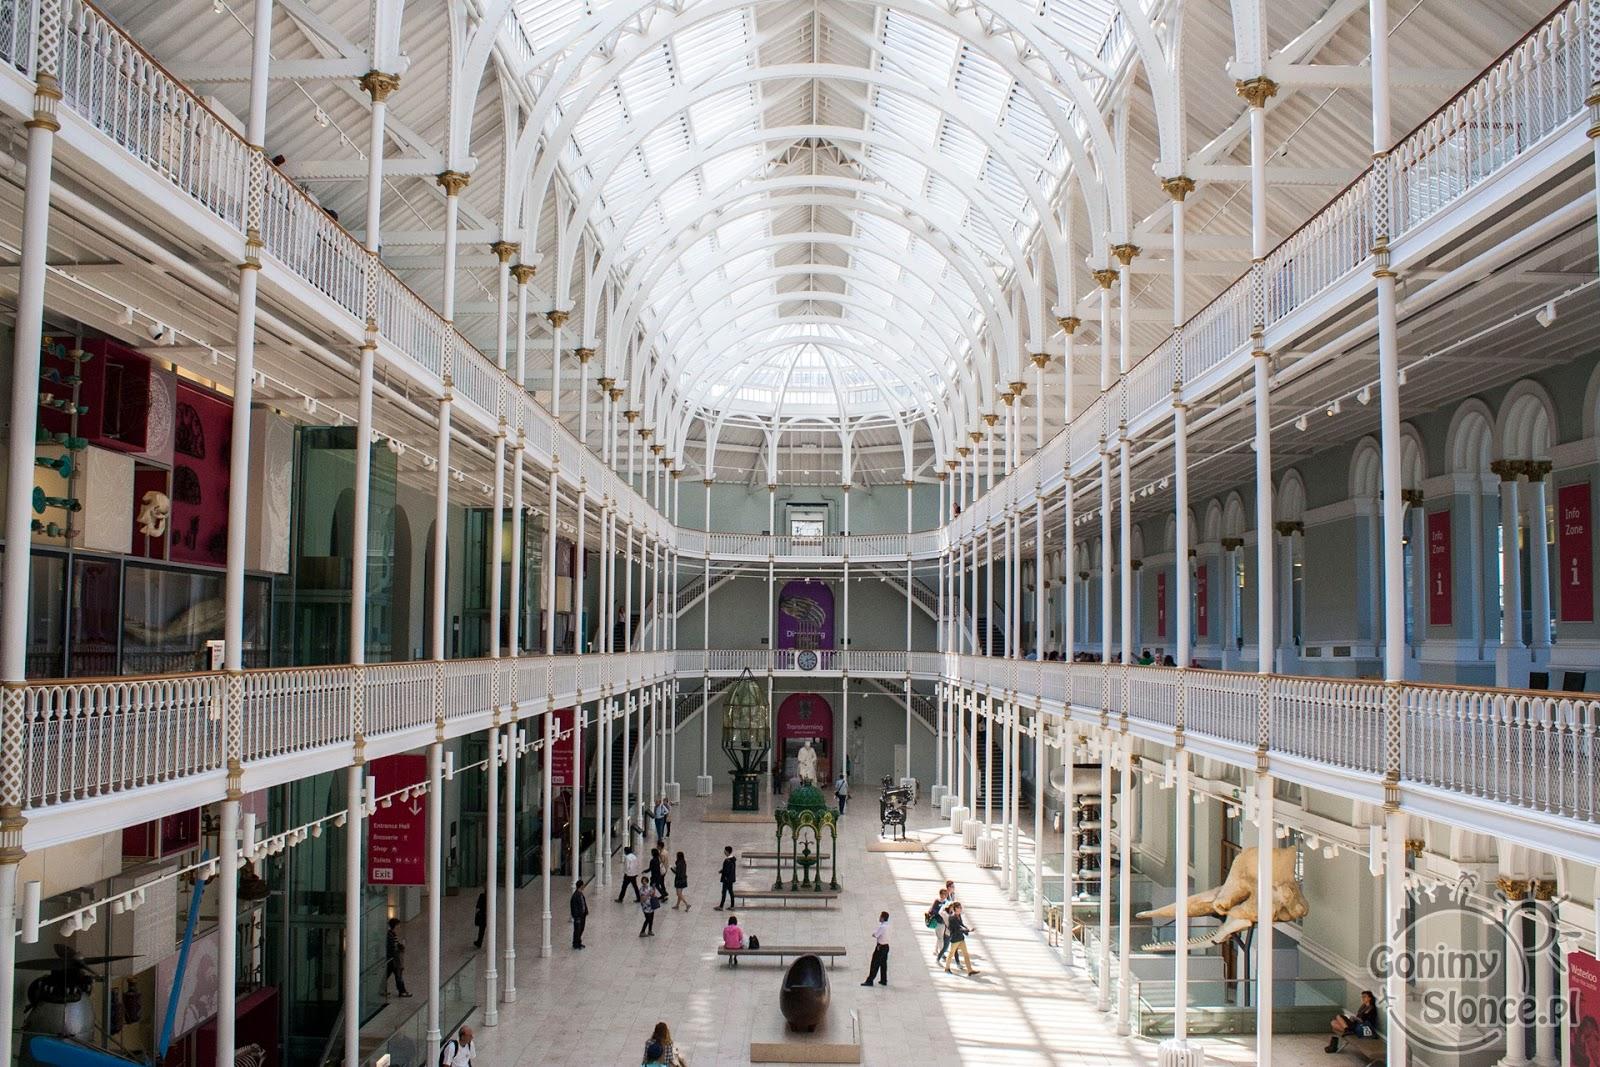 National Museum of Scotland, Edynburg